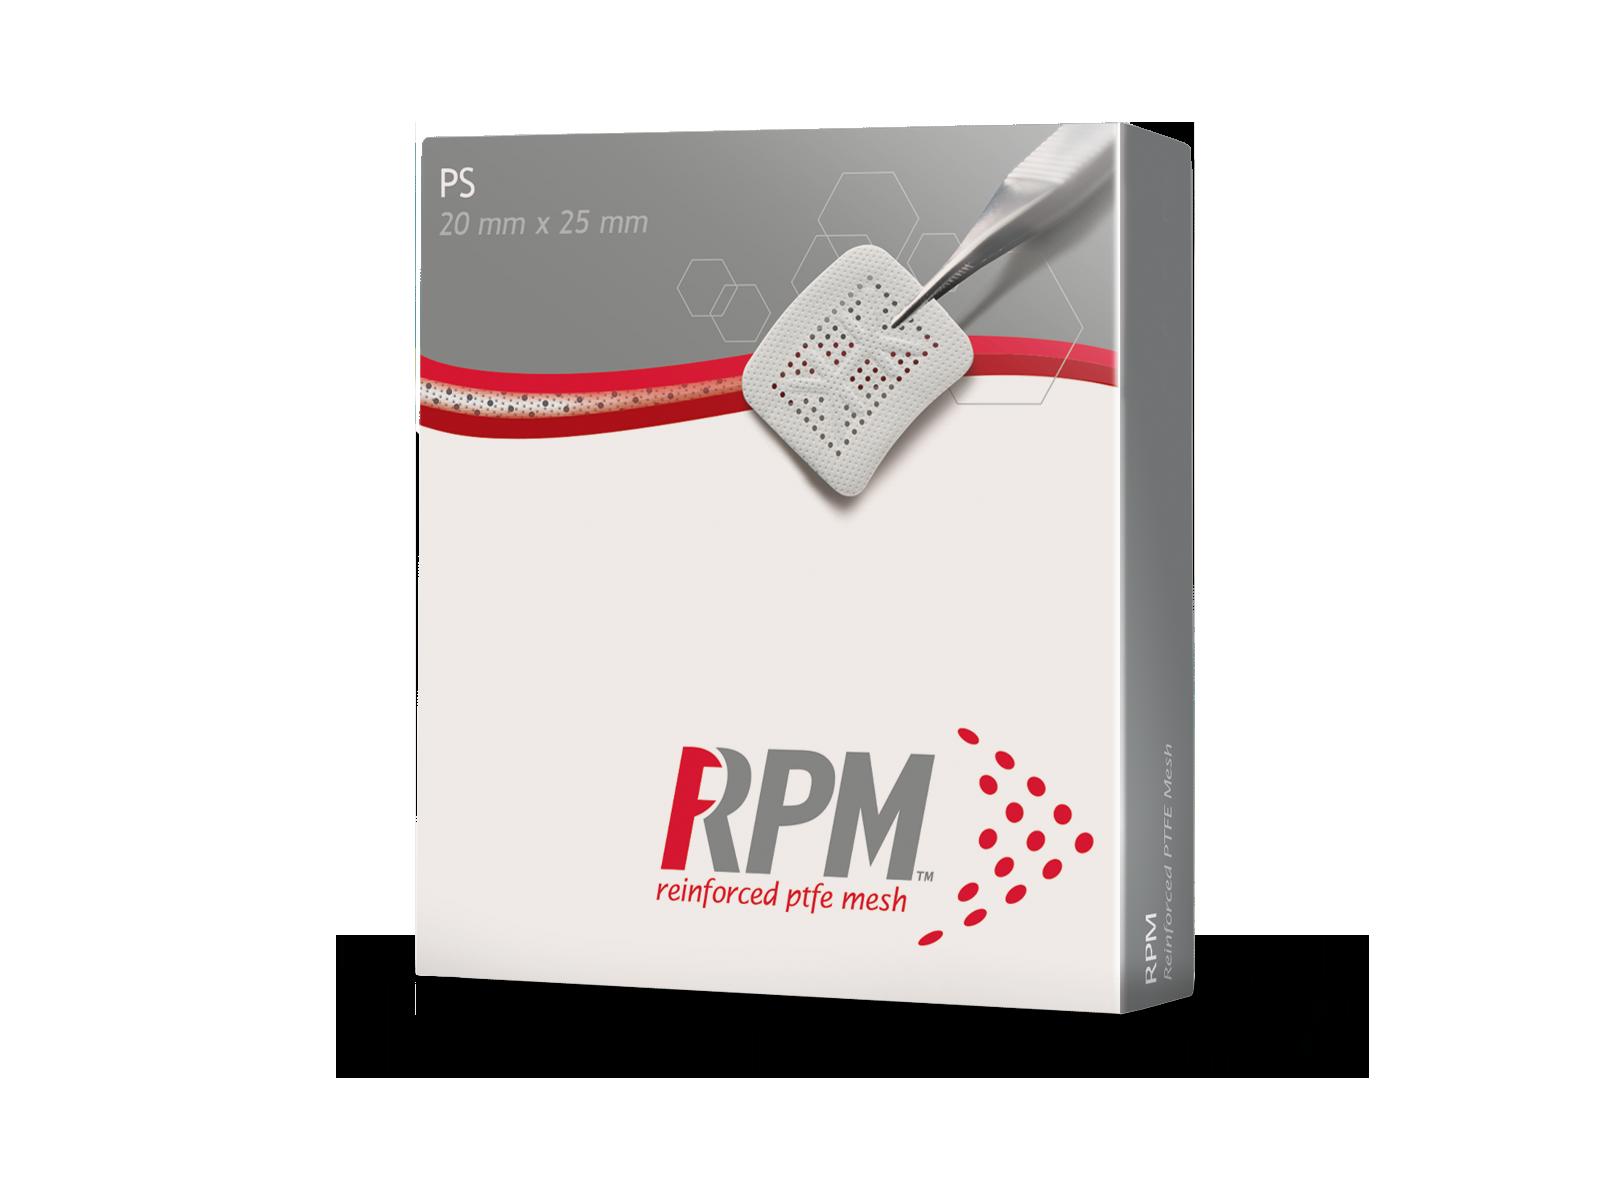 Picture of Geistlich RPM200PS Versatile Rectangular Shapes 20 mm x 25 mm, 1 Unit/Box